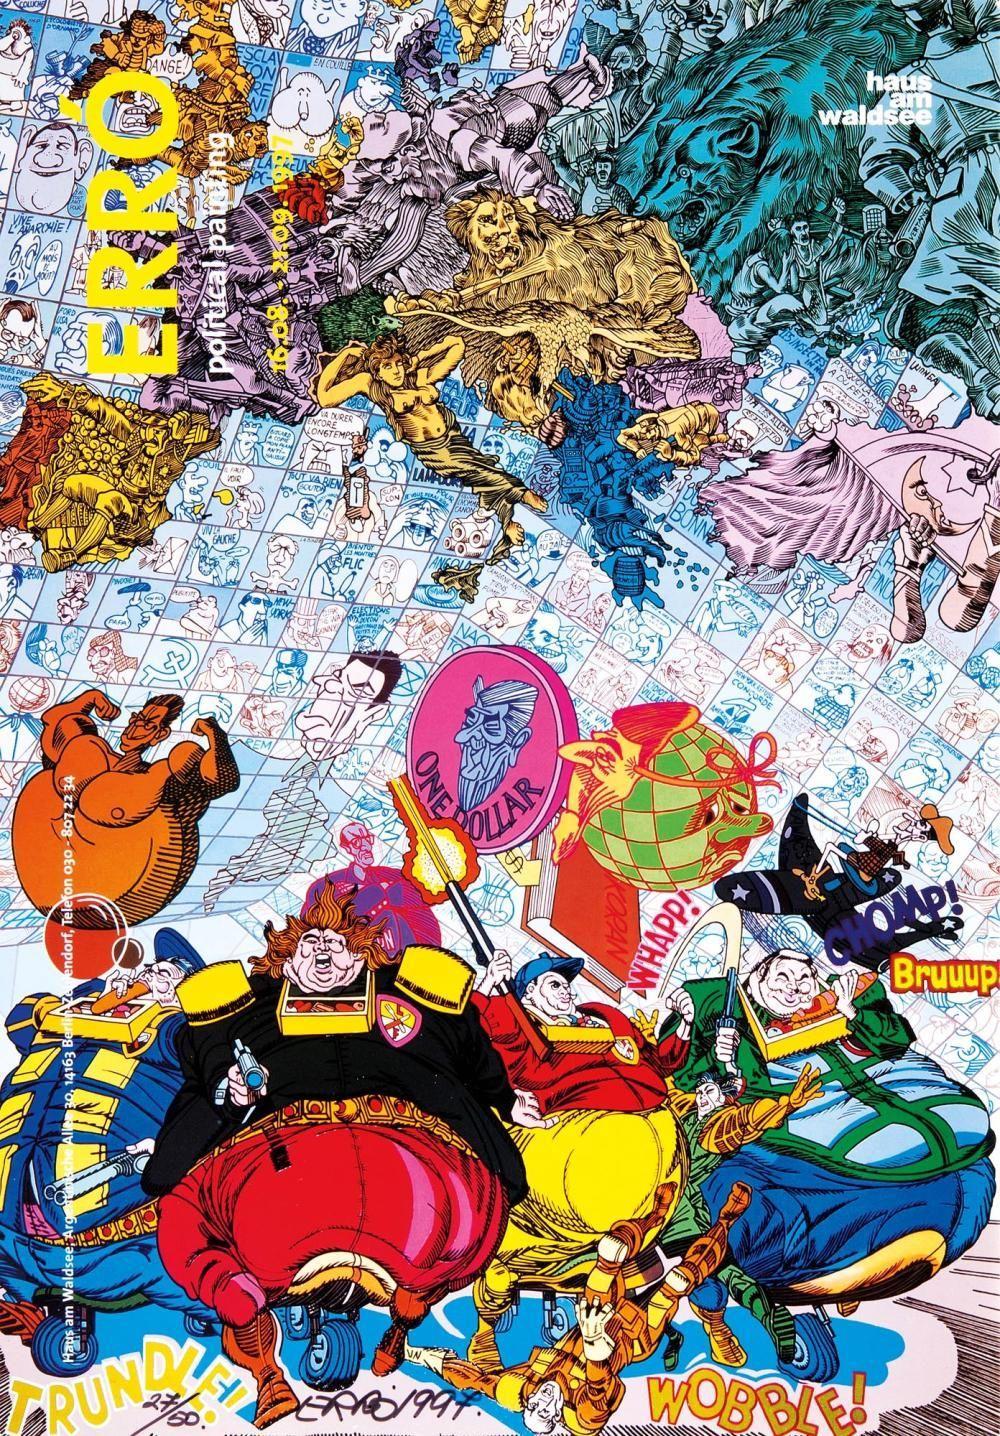 Erró - Political Painting, 1997